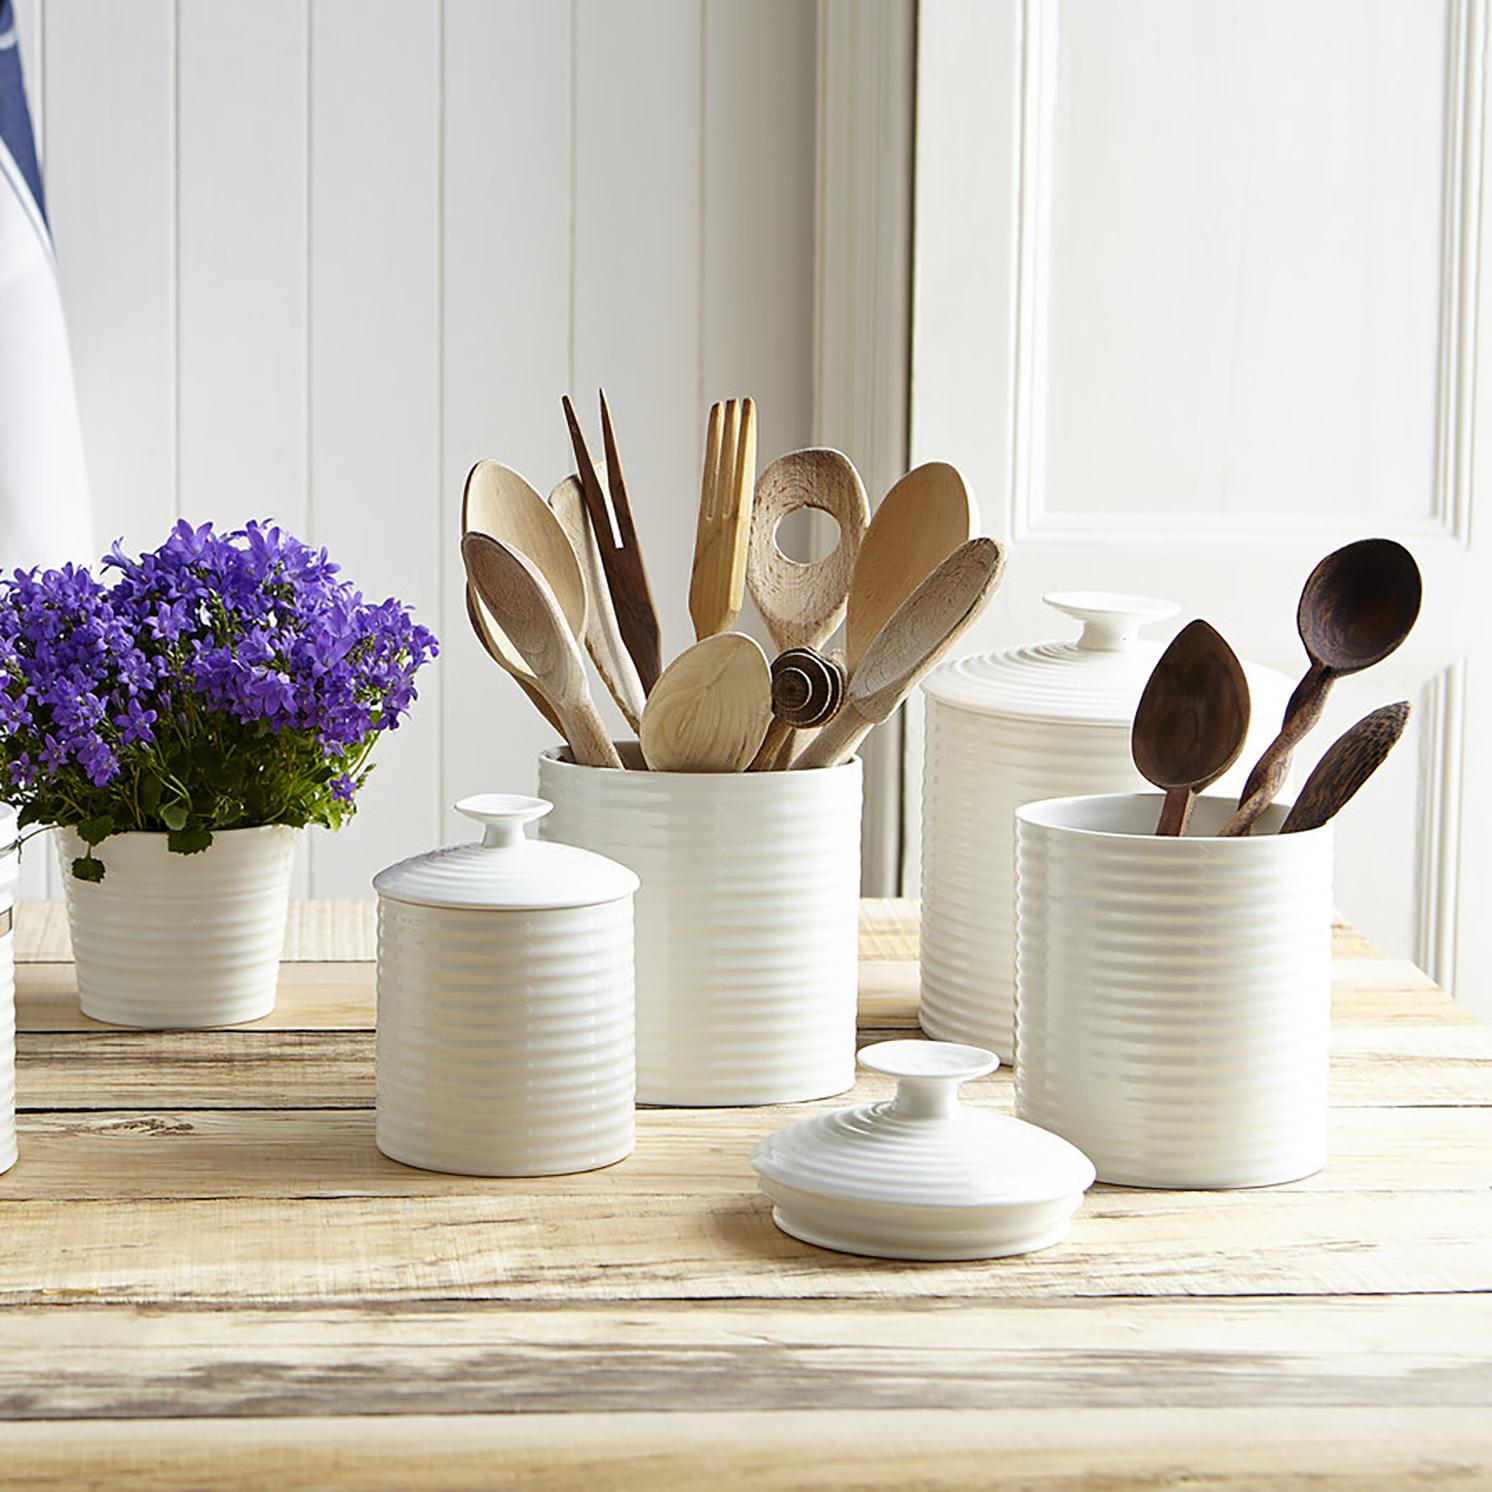 Sophie Conran for Portmeirion – White Large Oval Utensil Jar in Gift Box